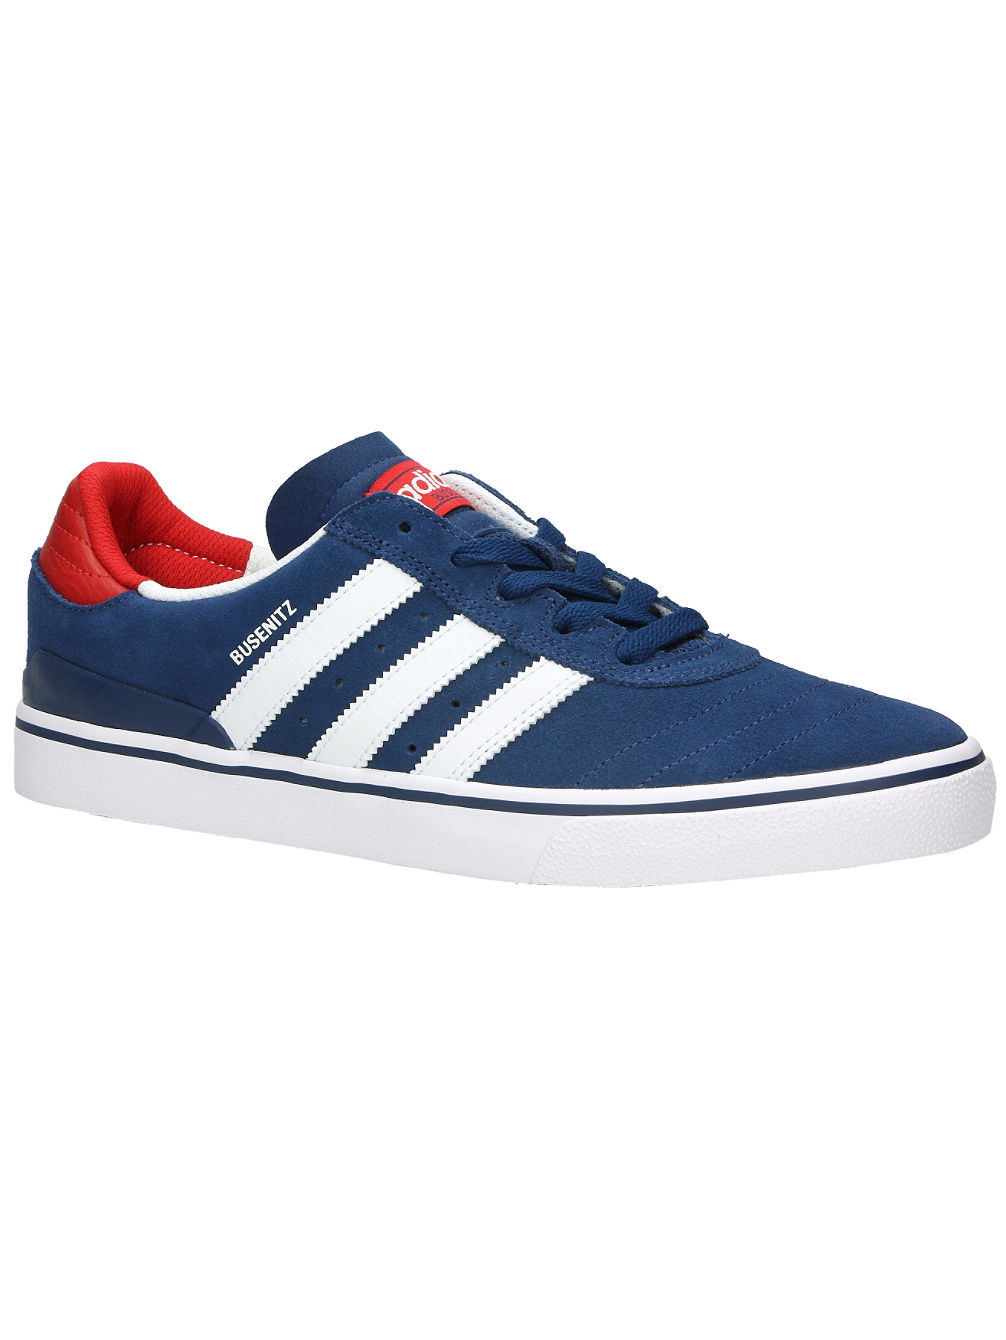 adidas-skateboarding-busenitz-vulc-adv-skate-shoes